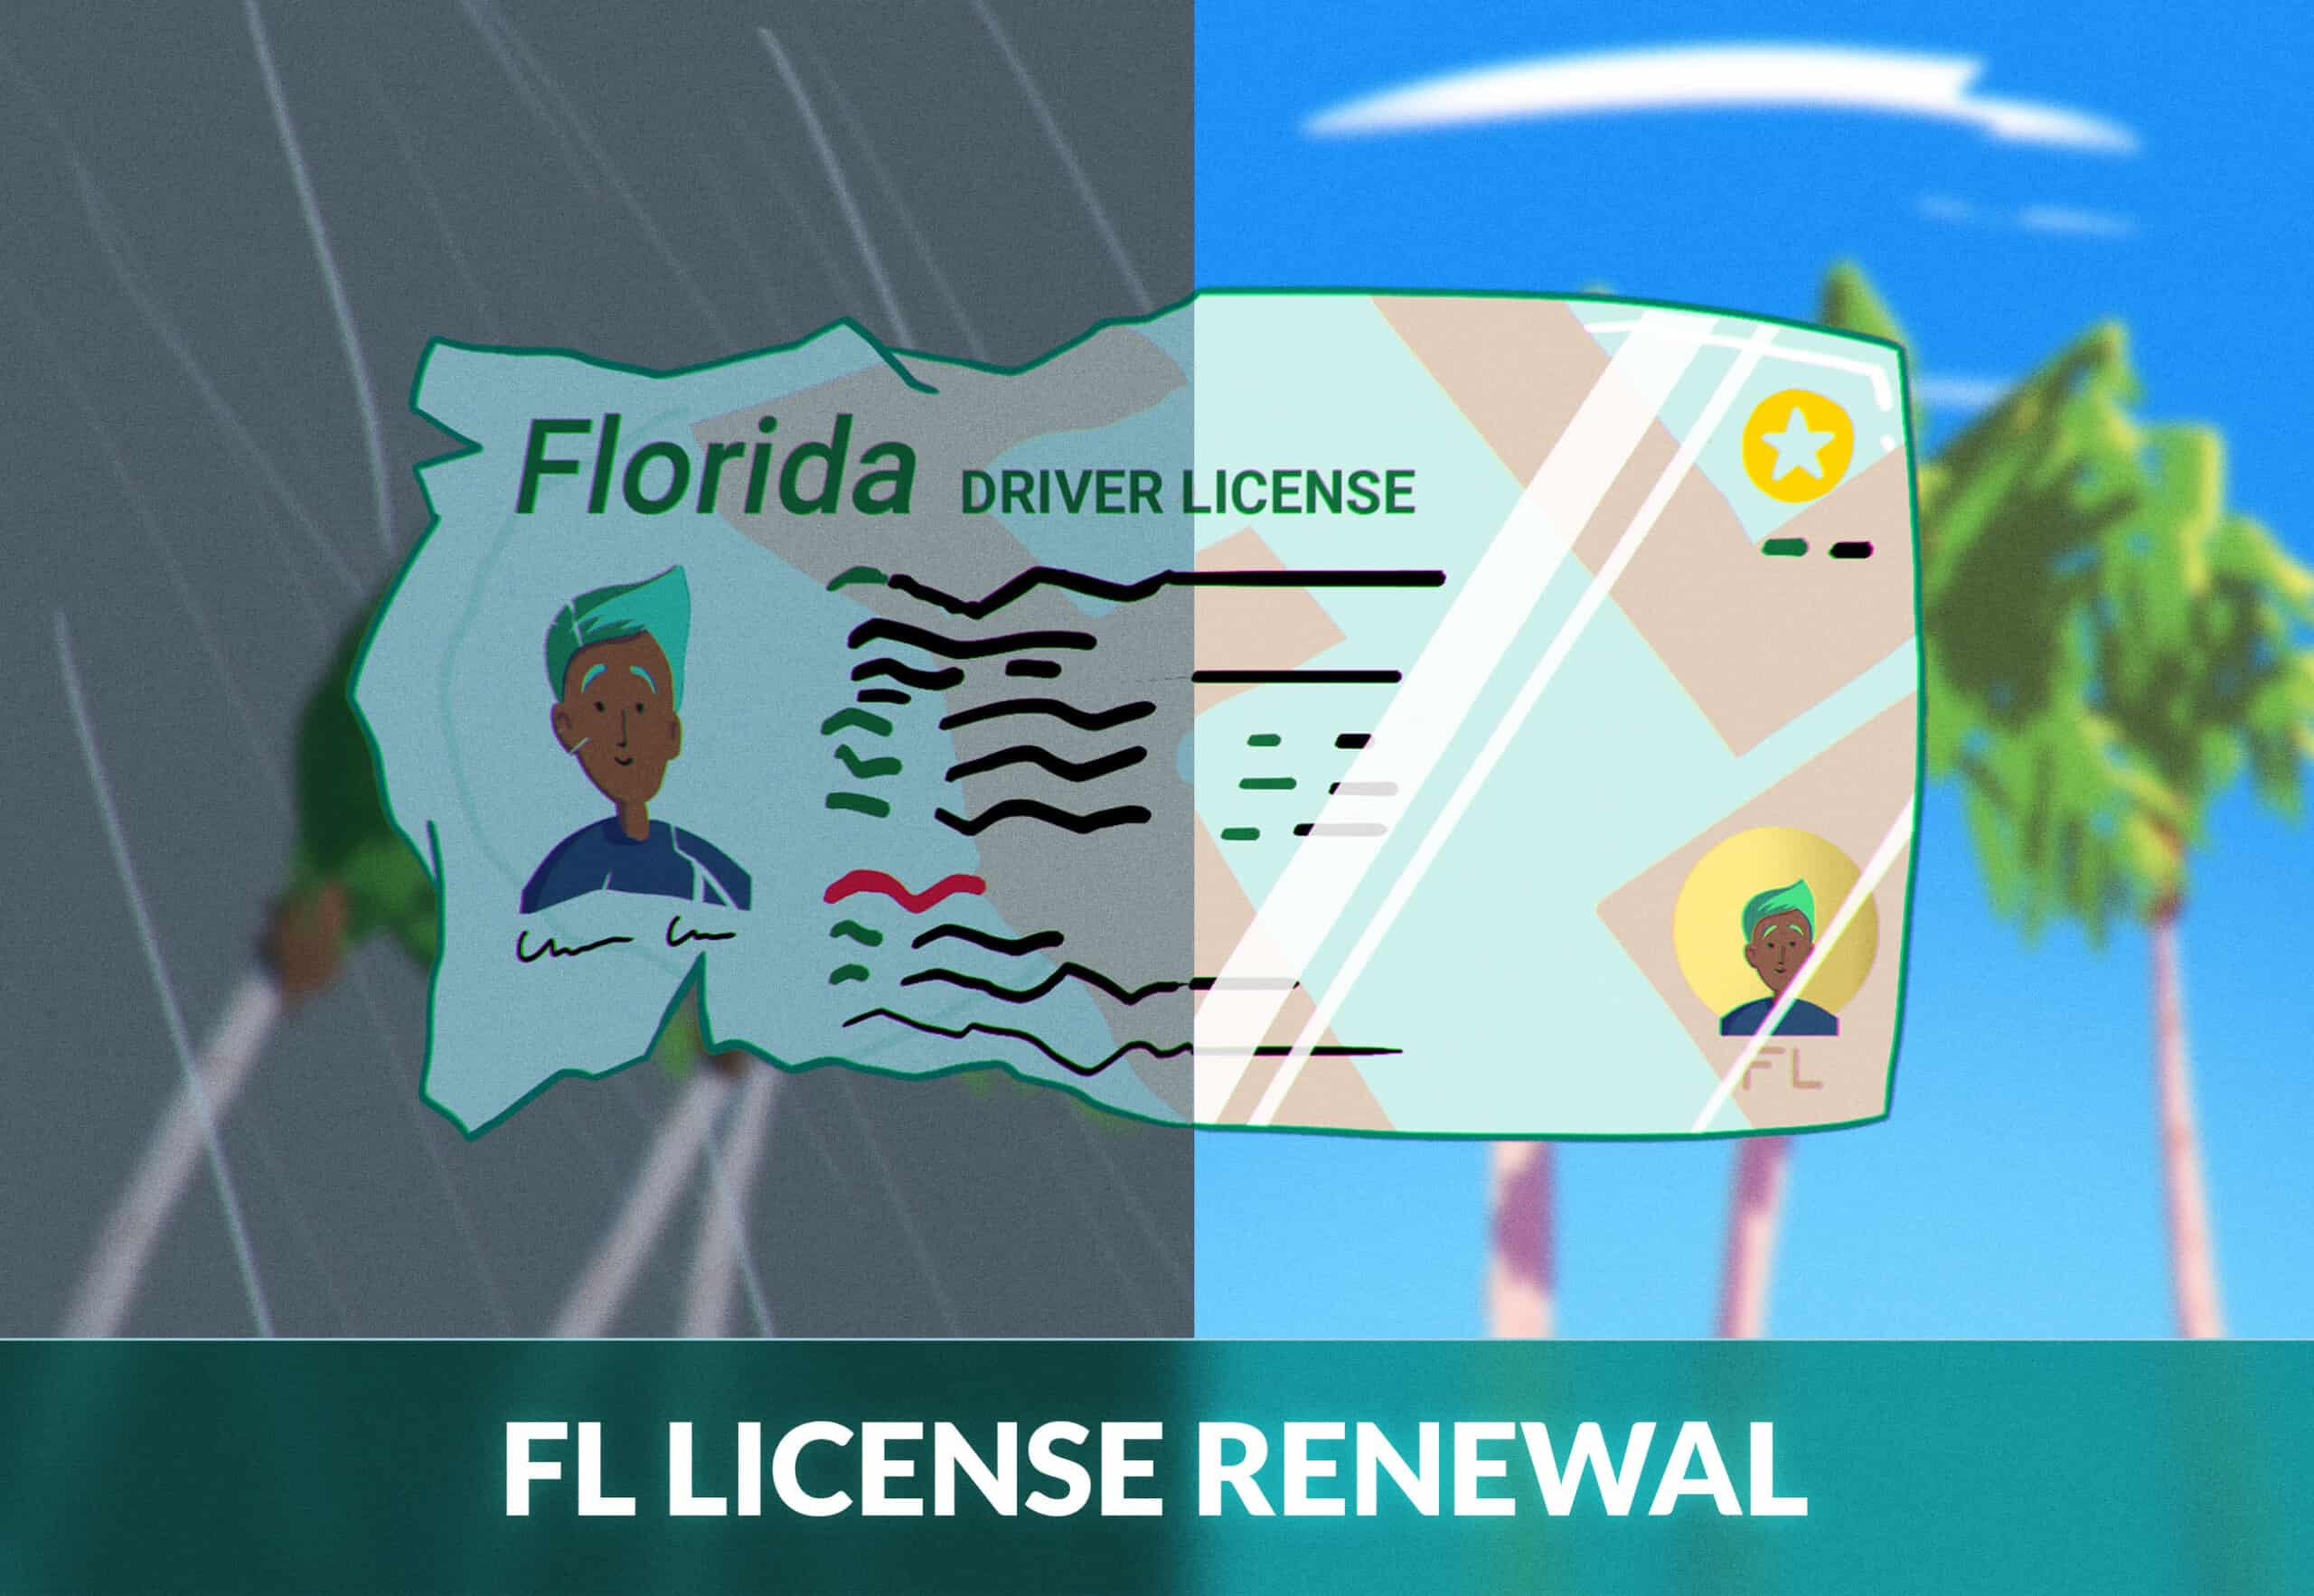 Florida driver's license renewal